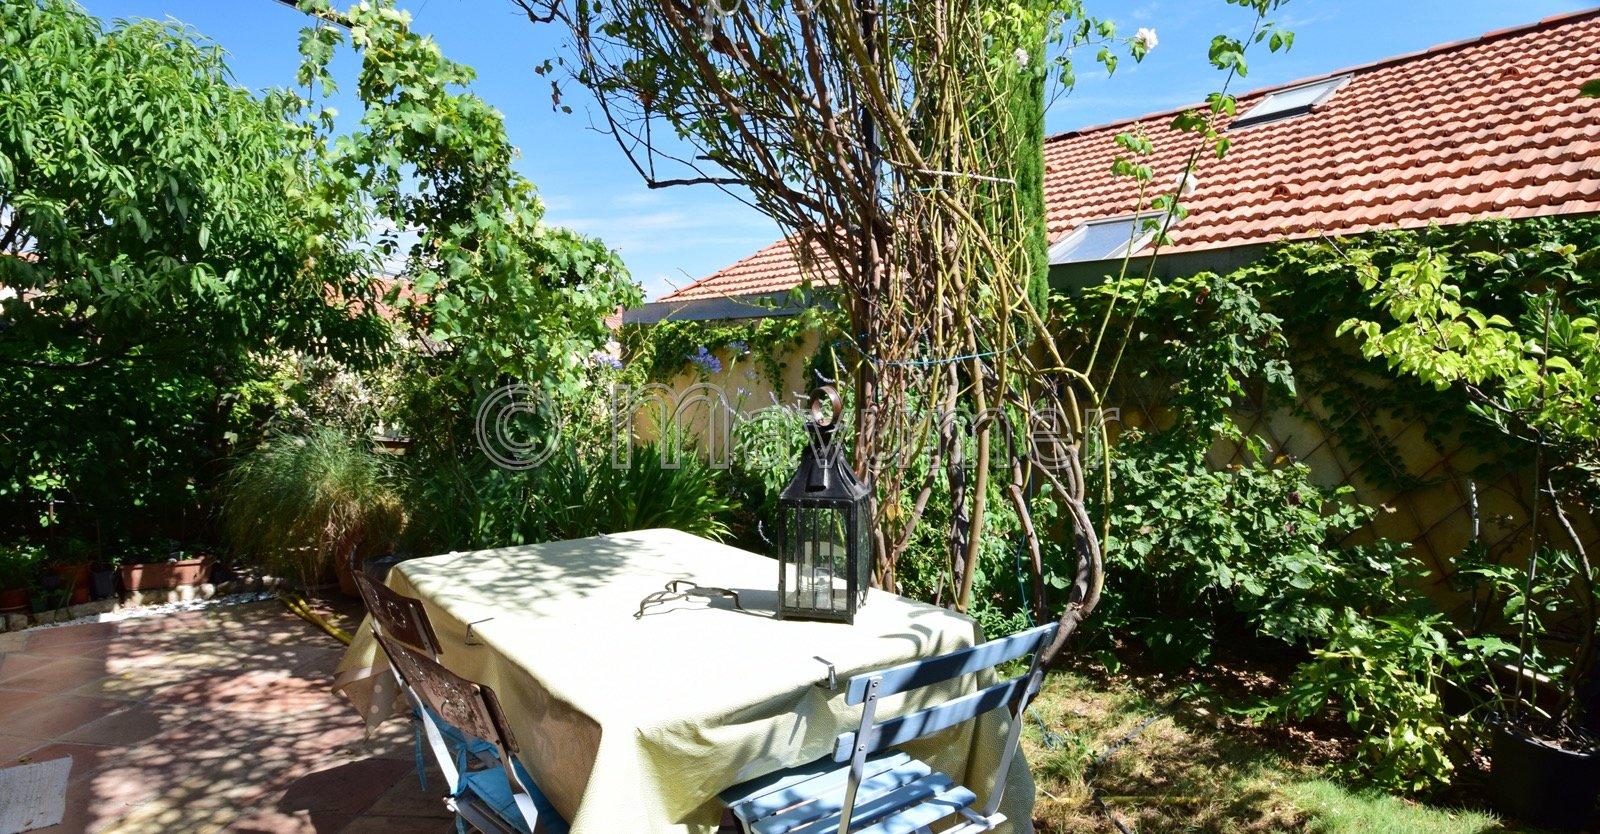 Charmante Maison avec jardin, vue mer- 13016- Mourepiane